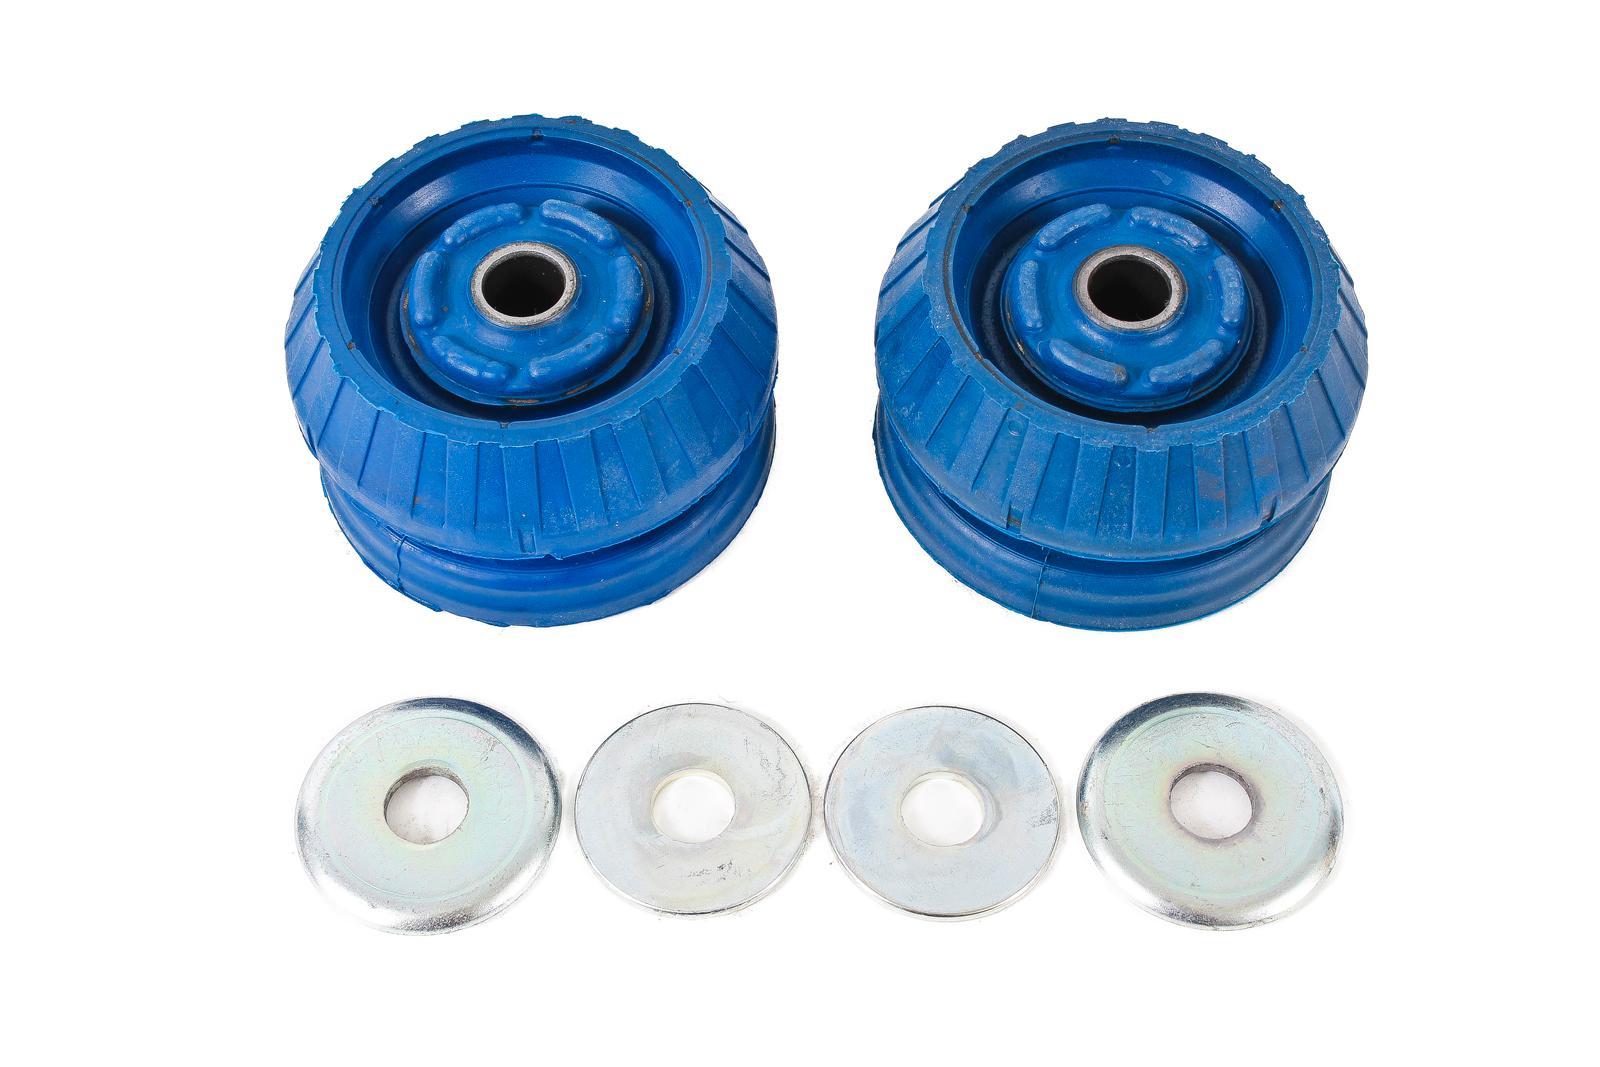 hight resolution of bmr suspension spf 1590ak bushing kit front strut mounts with bearings polyelast 2008 2009 pontiac g8